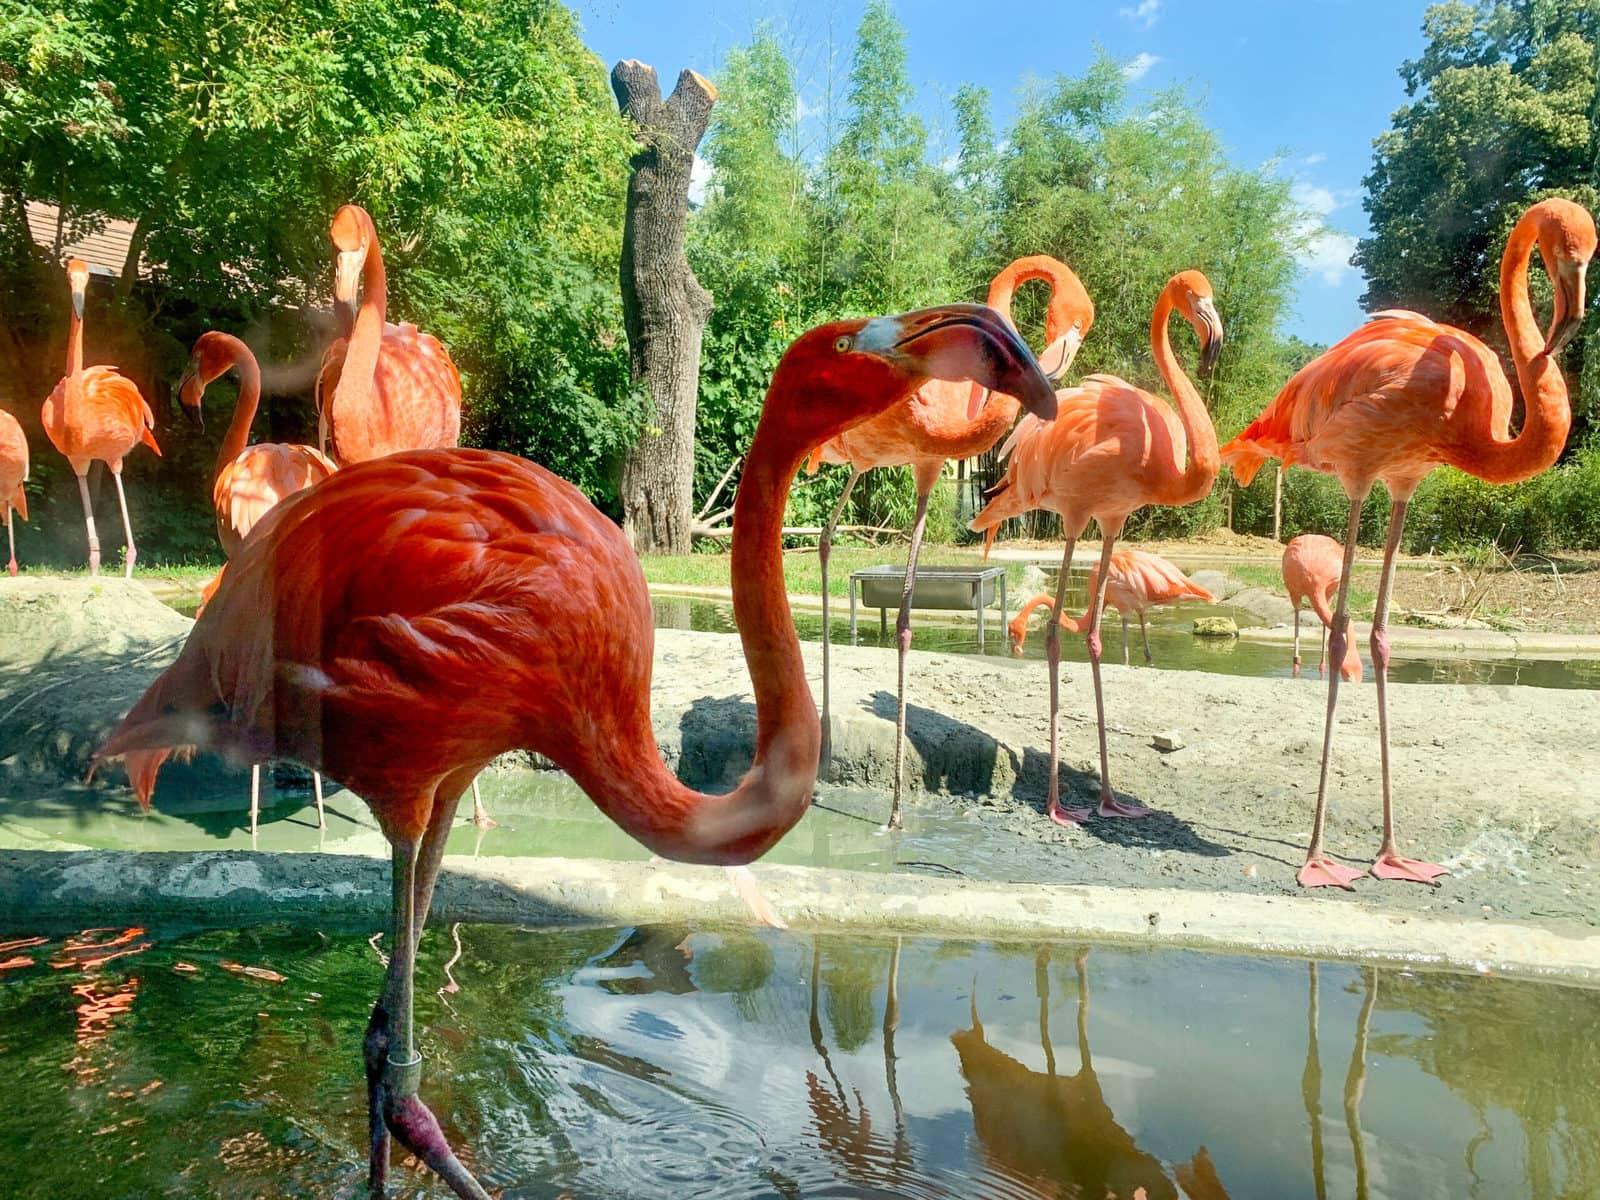 Tiergarten Schönbrunn, Zoo, Wien